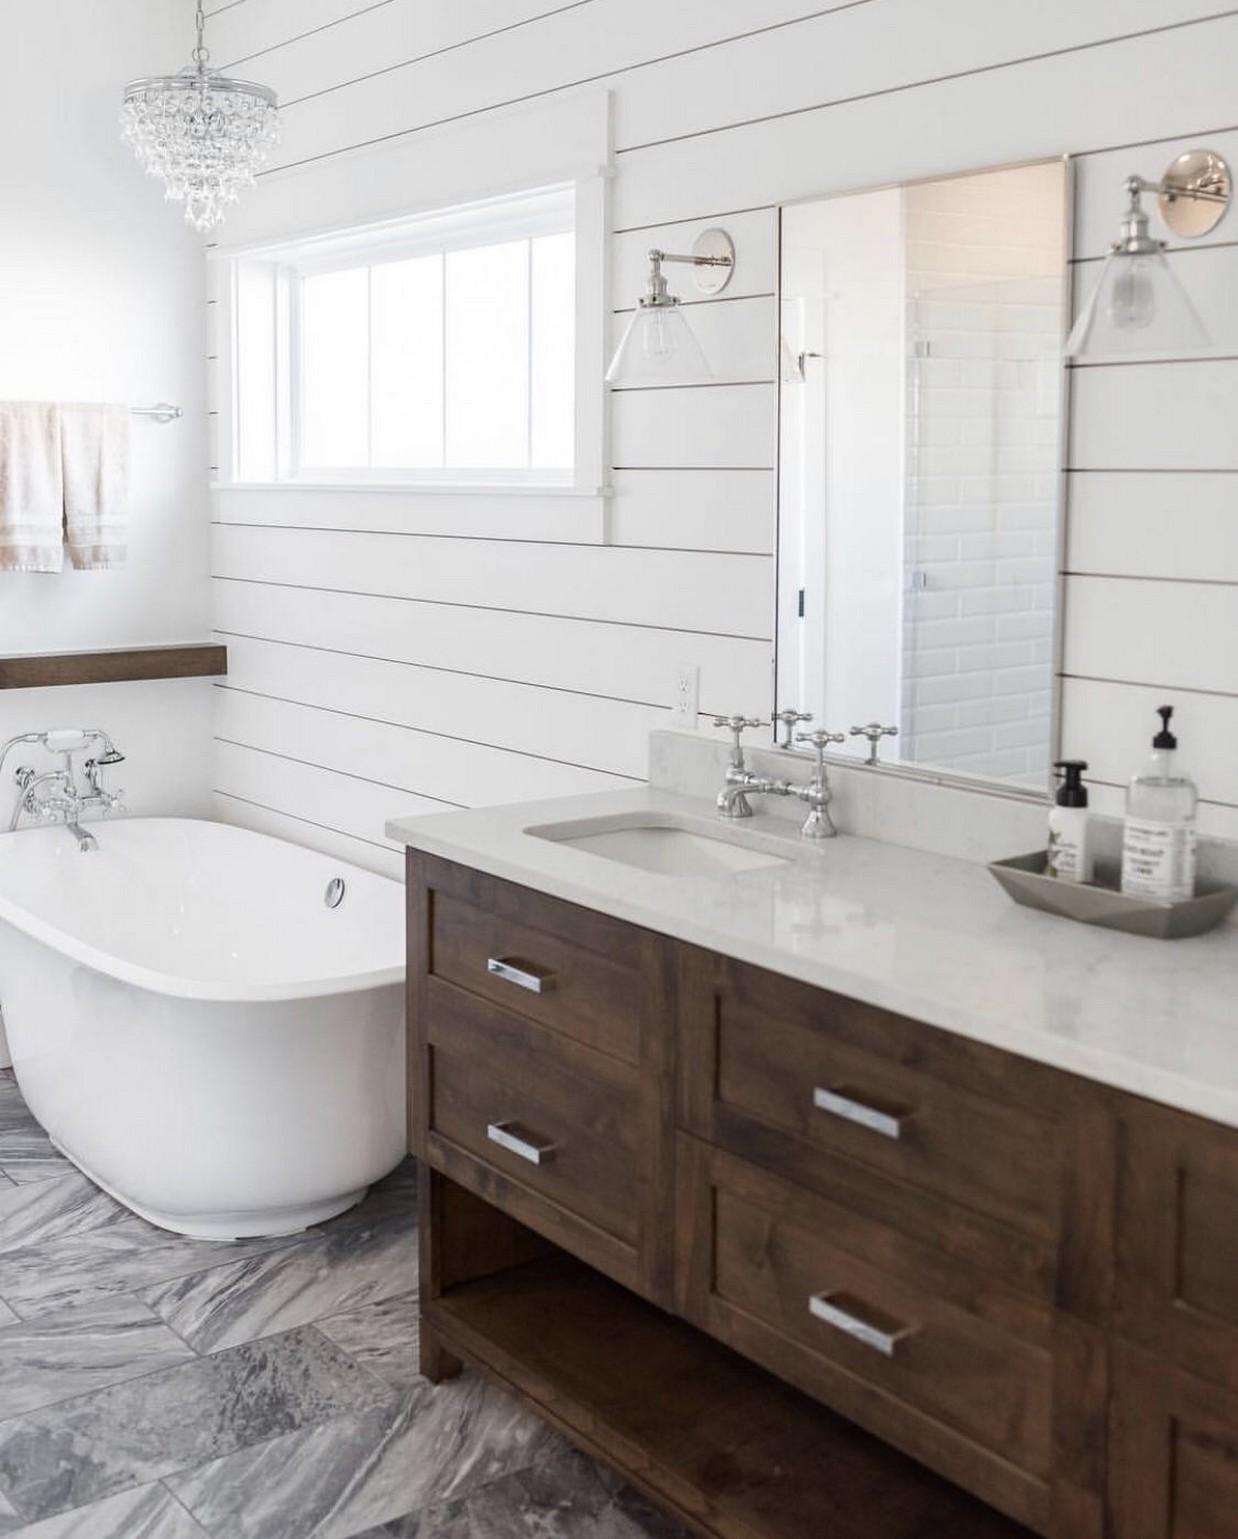 80 Bathroom Renovations Tips Home Decor 70